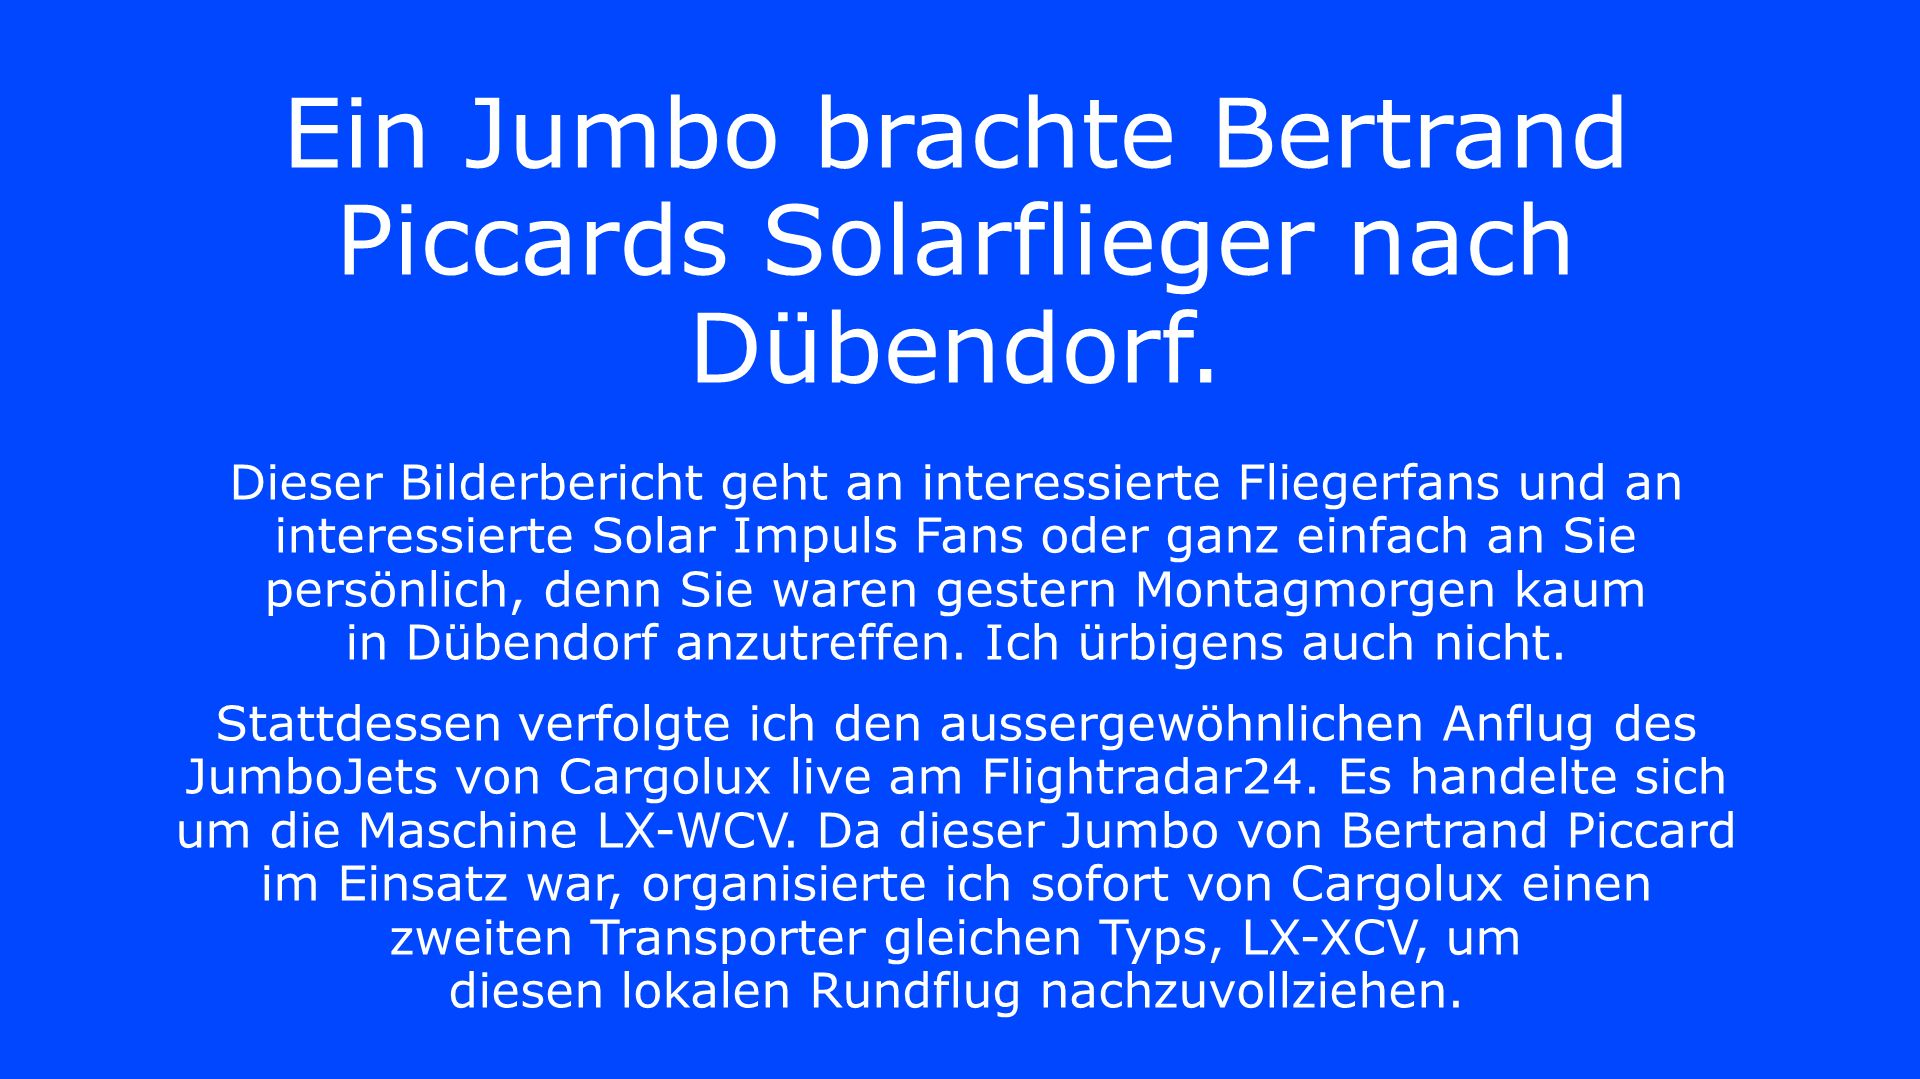 Ein Jumbo brachte Bertrand Piccards Solarflieger nach Dübendorf. Dieser Bilderbericht geht an interessierte Fliegerfans und an interessierte Solar Imp